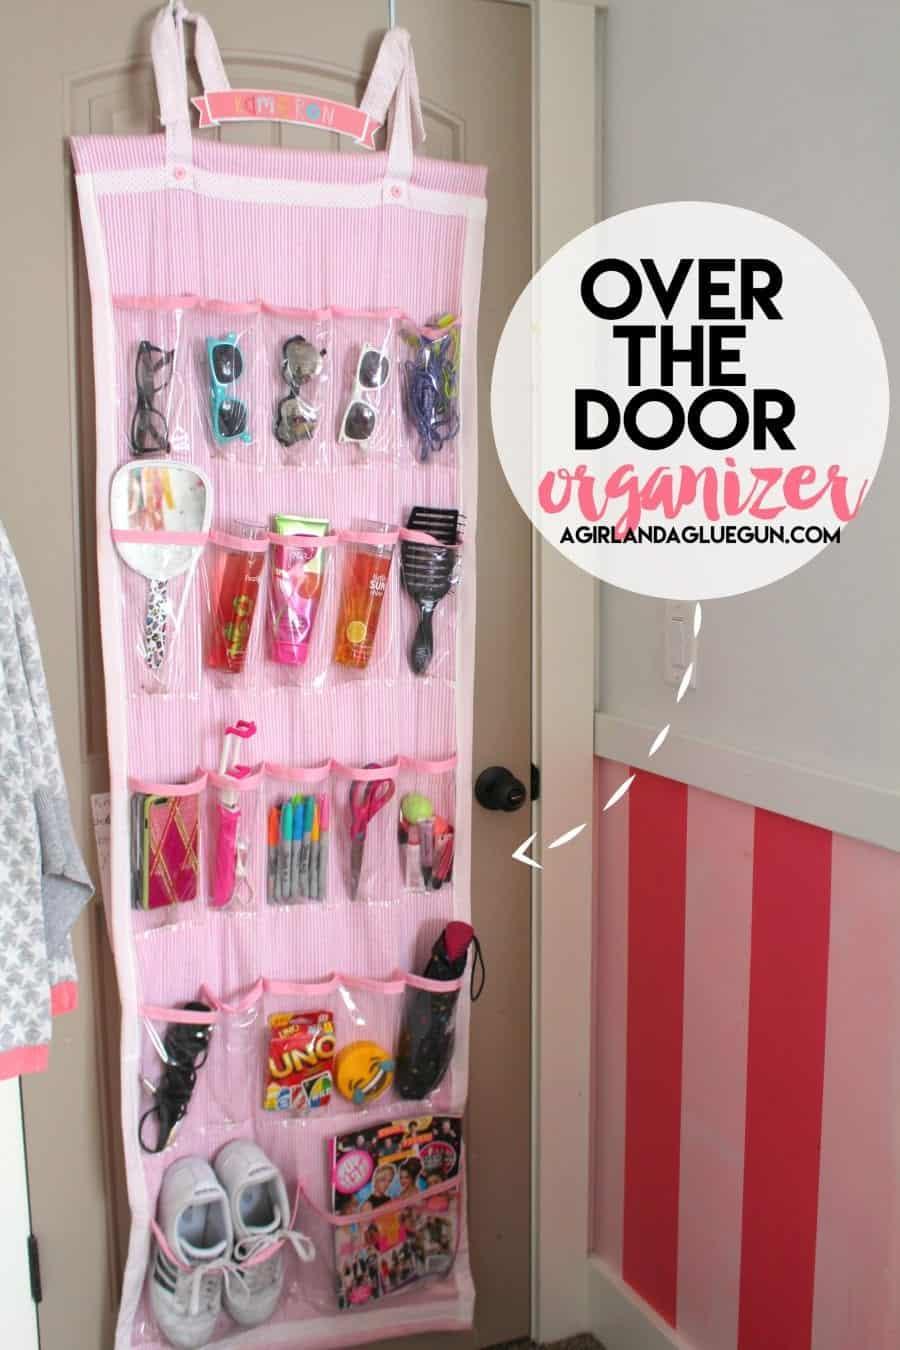 Sightly Over Door Organizer You Can Sew Barbie Organizer A Girl Cleaning Supplies Over Door Organizer Tall Doors A Glue Gun Over Door Organizer houzz 01 Over The Door Organizer